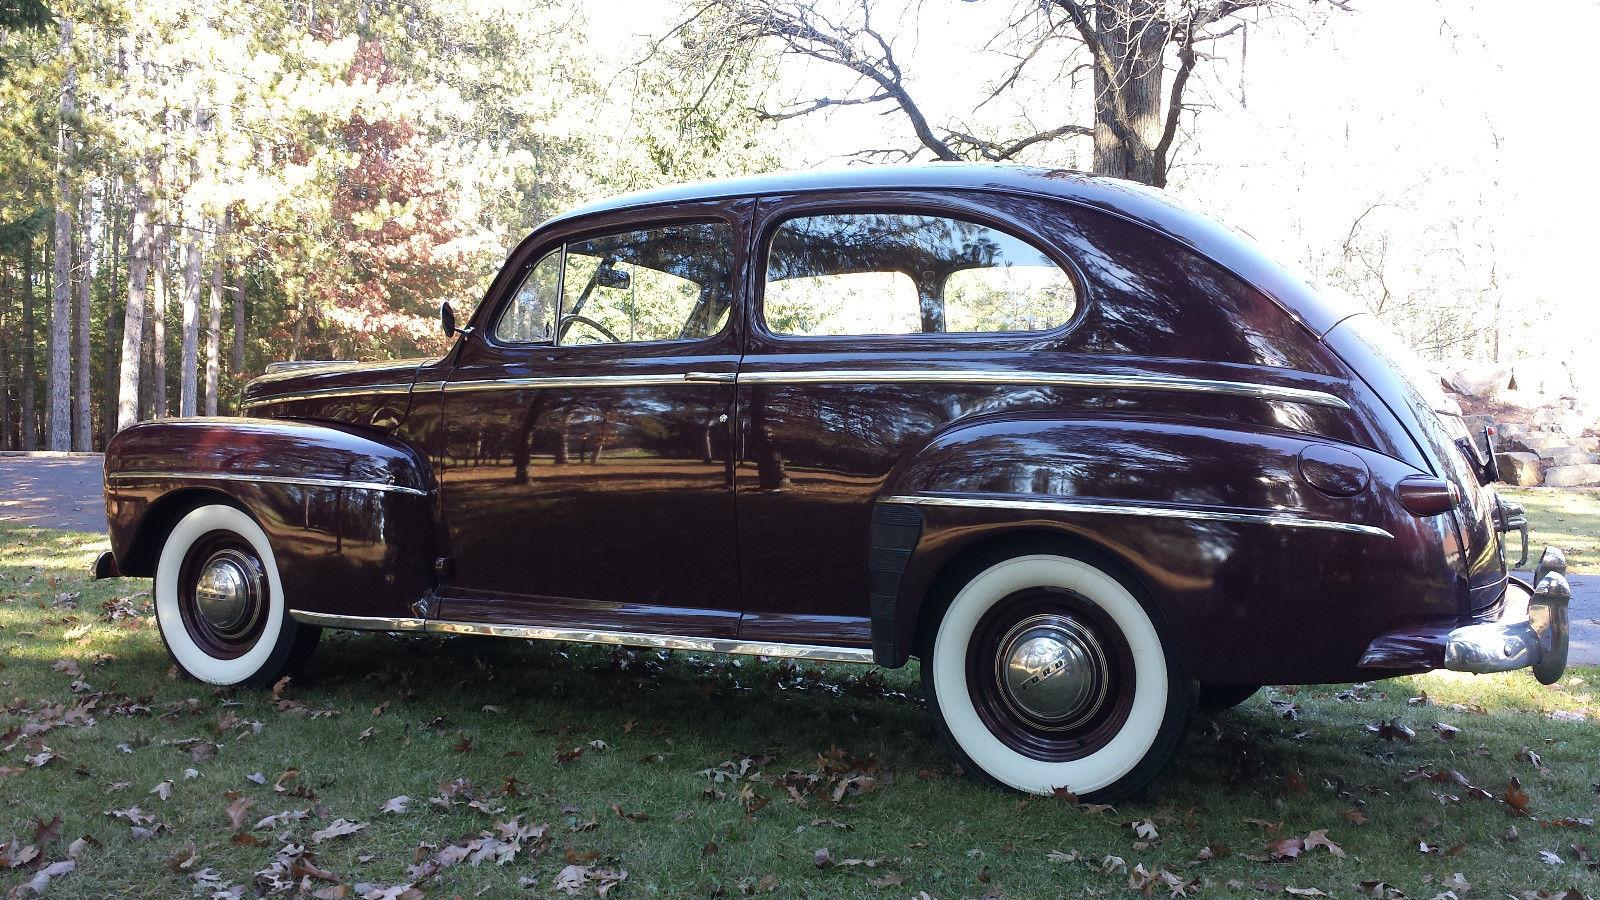 All American Classic Cars 1948 Ford Deluxe Tudor 2 Door Sedan